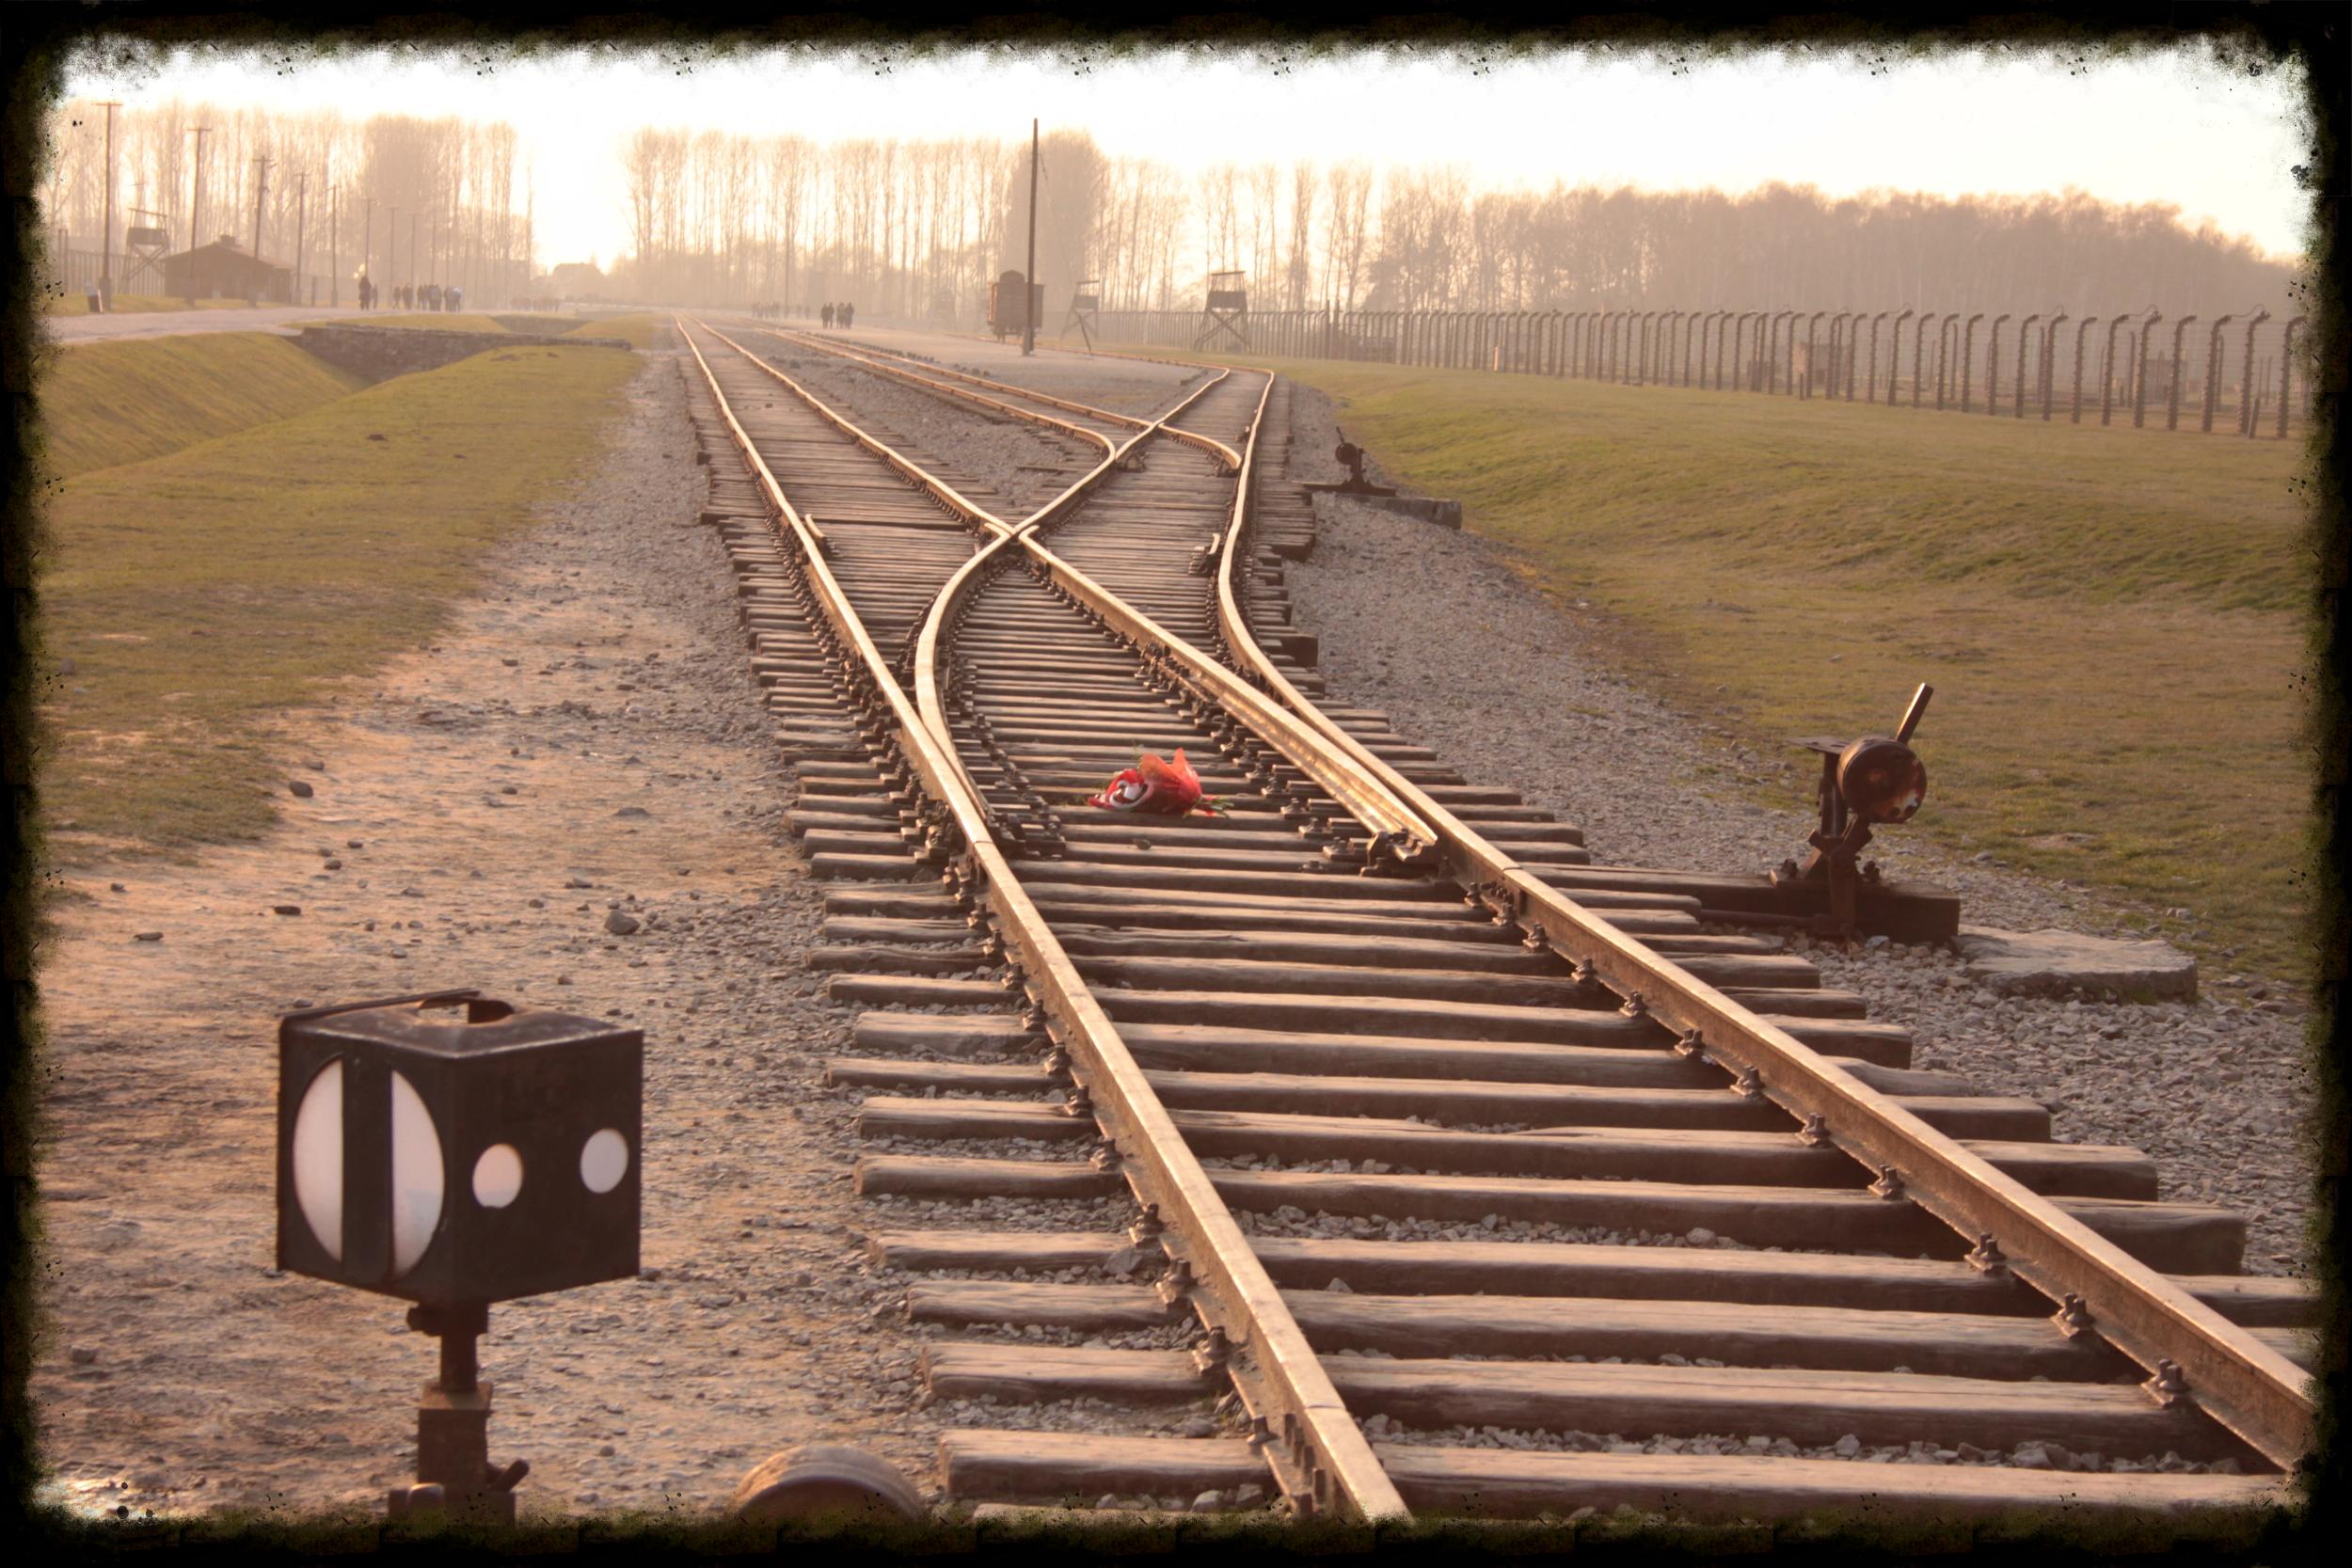 The Railway to Auschwitz